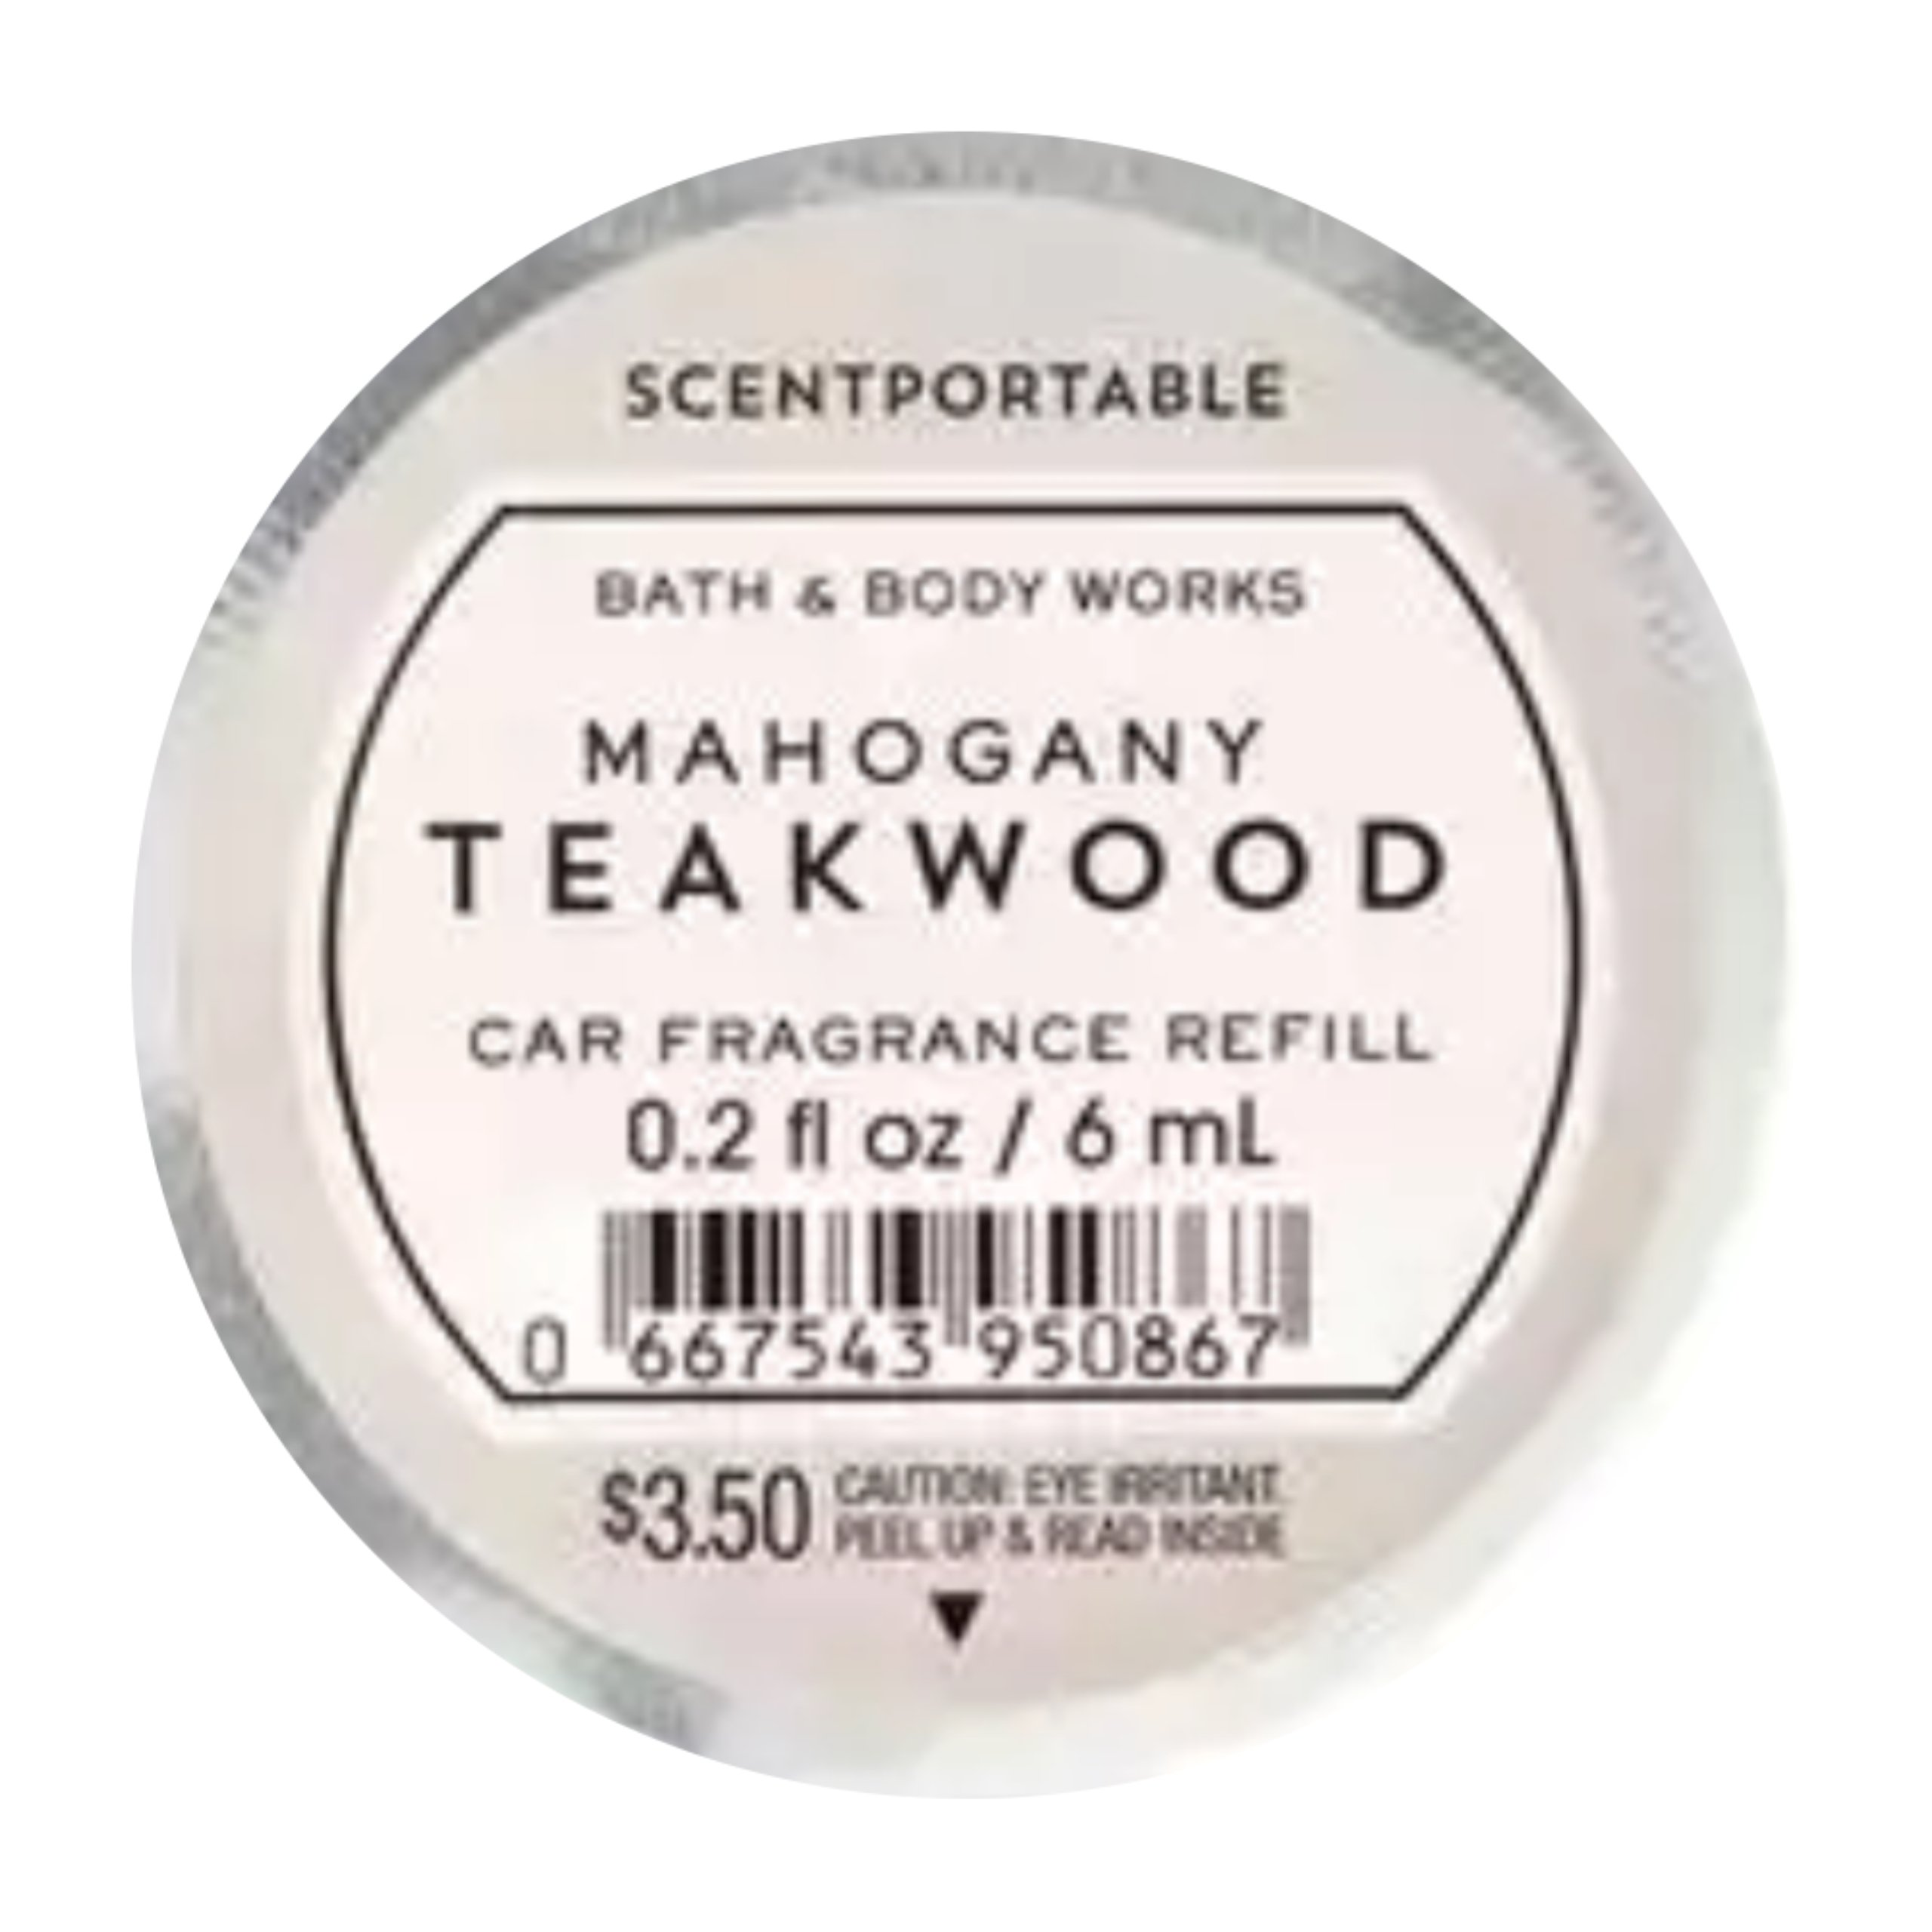 Bath Body Works Scentportable Fragrance Refill Disc Mahogany Teakwood